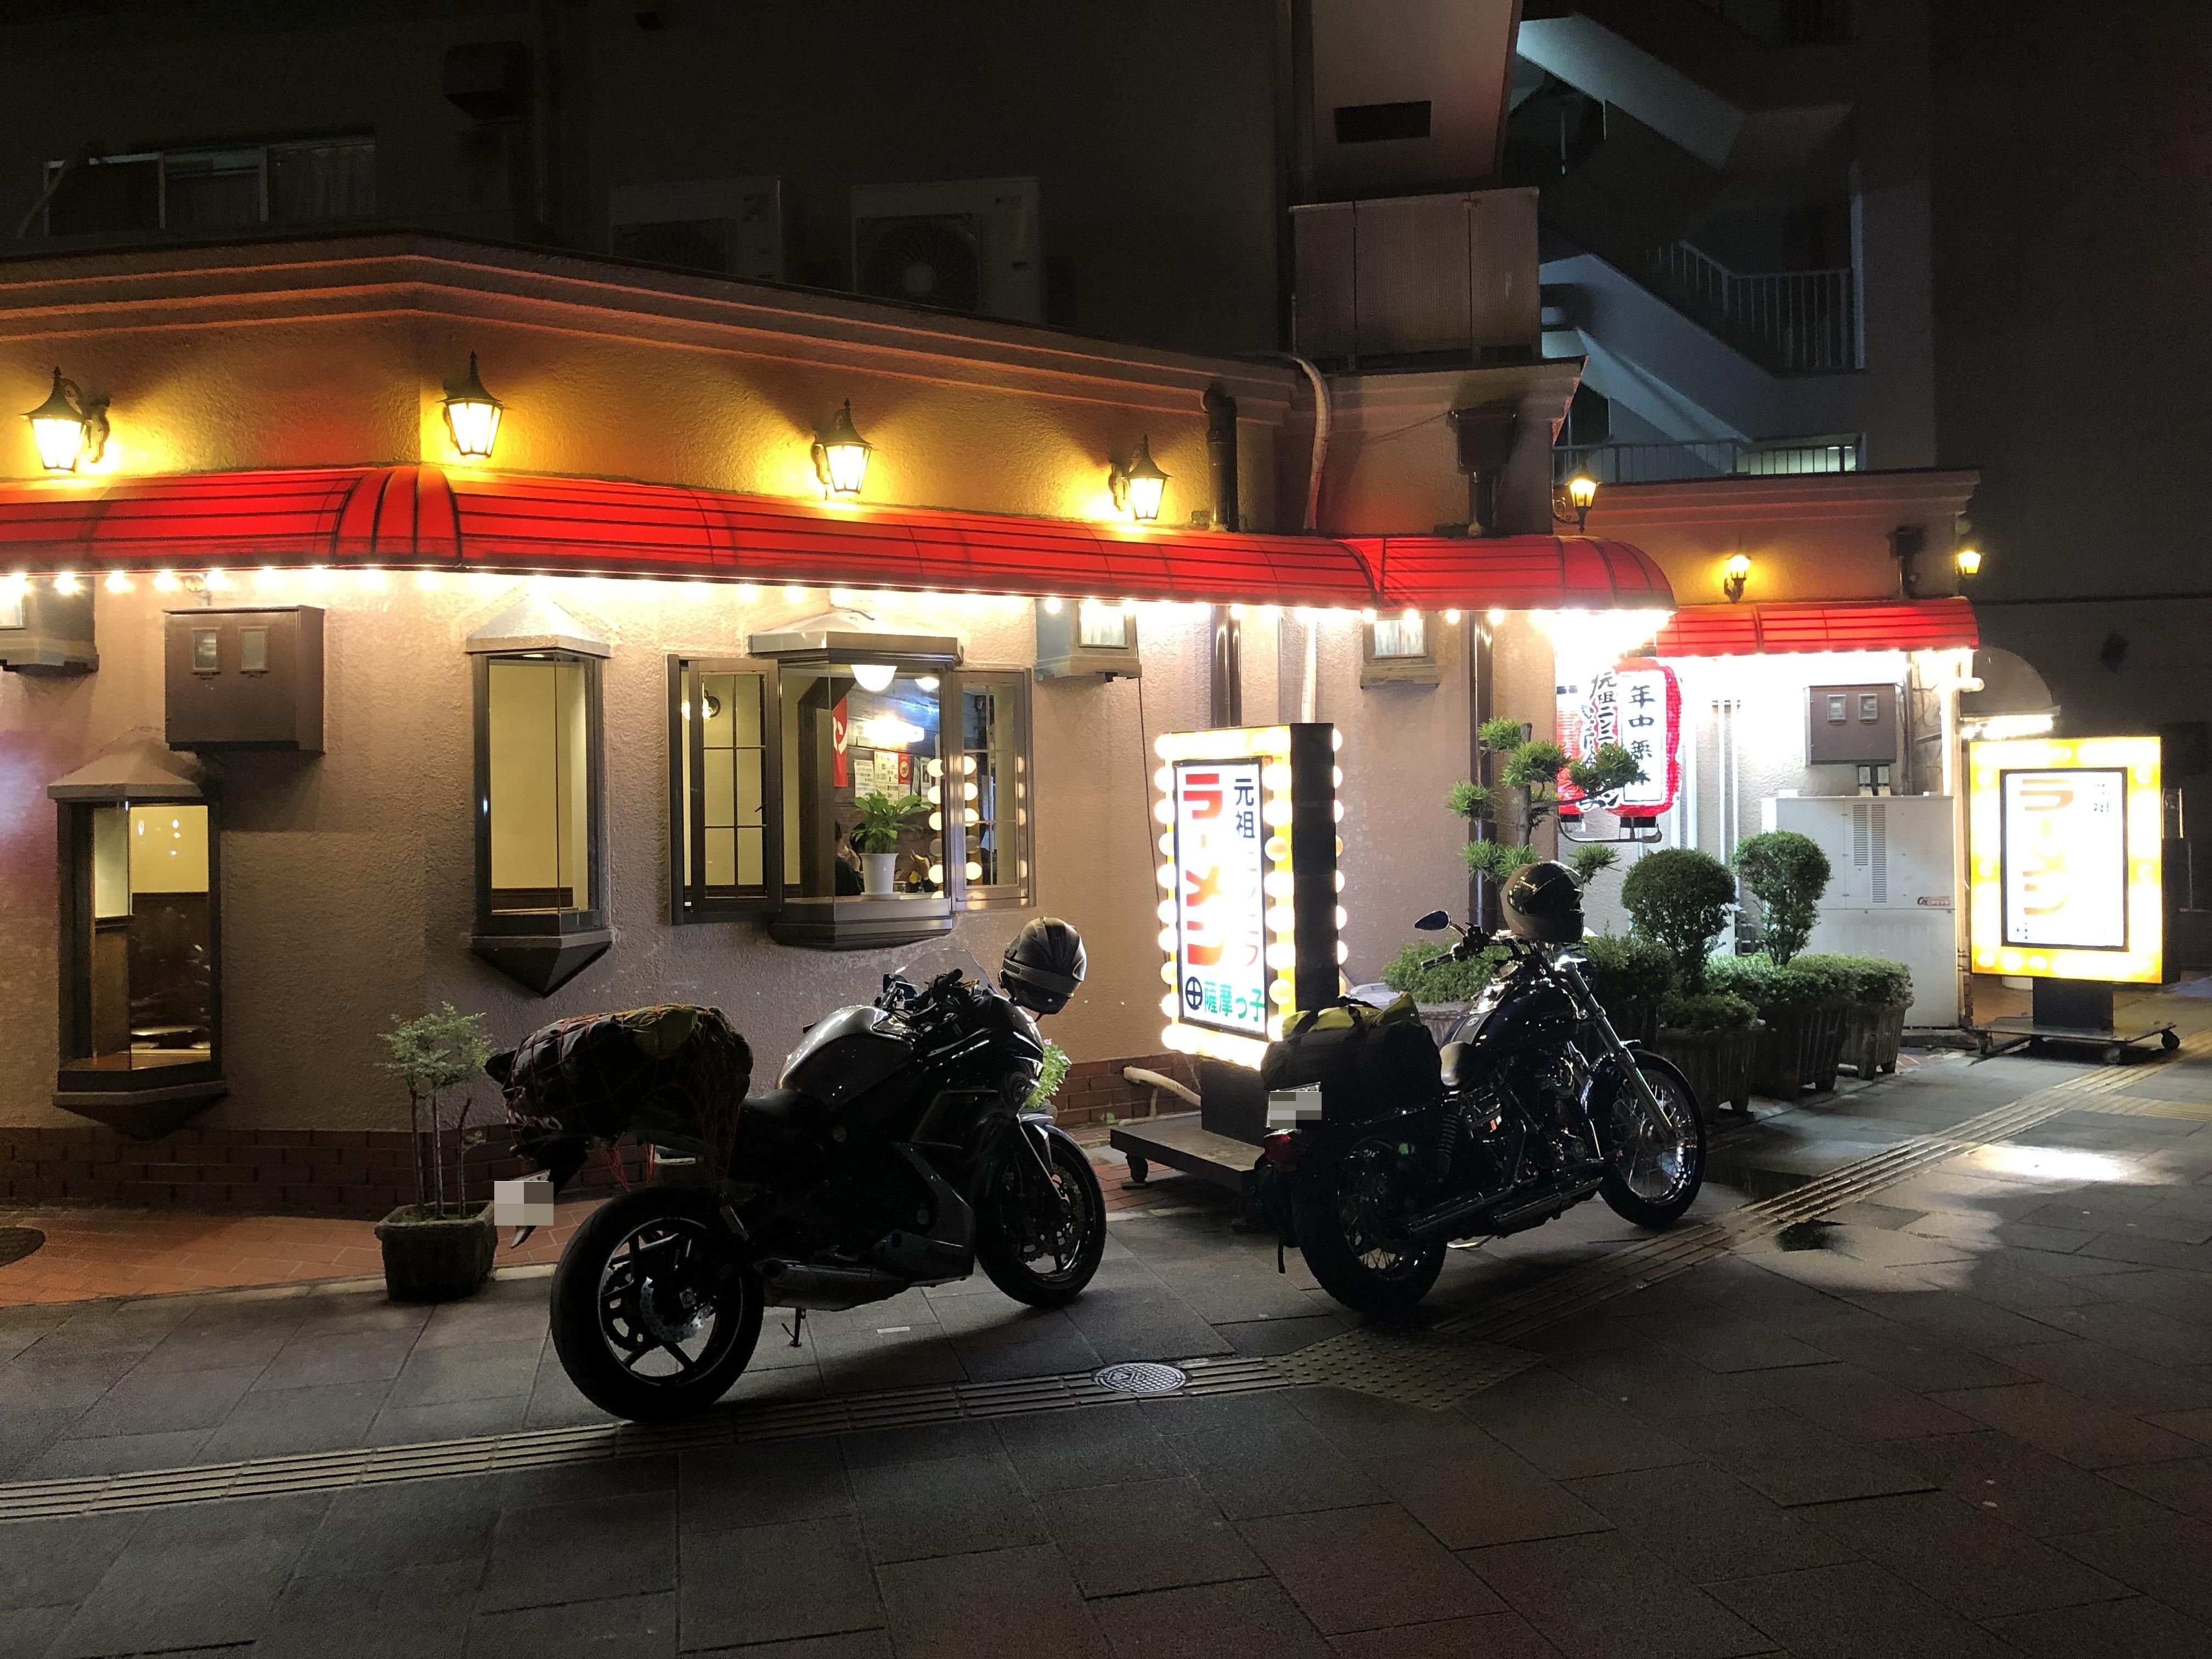 harleydavidson-dyna-capemuroto-motorcycle-touring-ramen.jpg